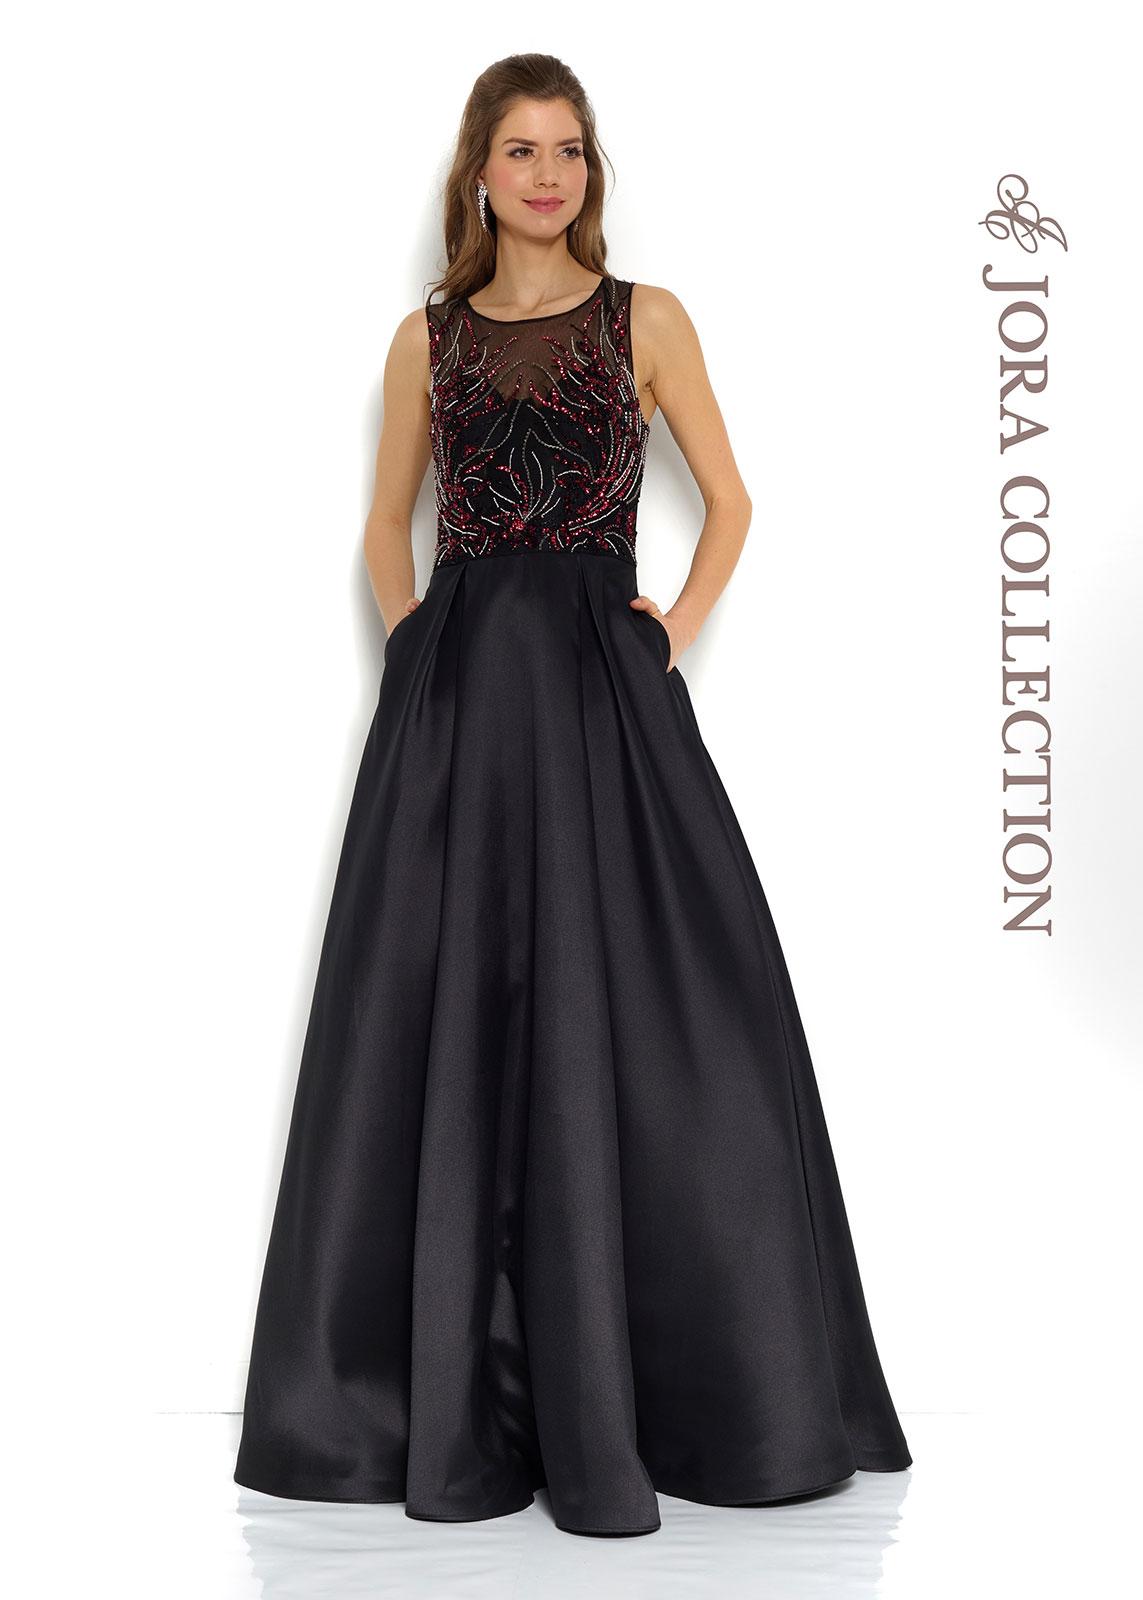 Jora Collections | Fine quality prom dresses & formal wear - Jora ...